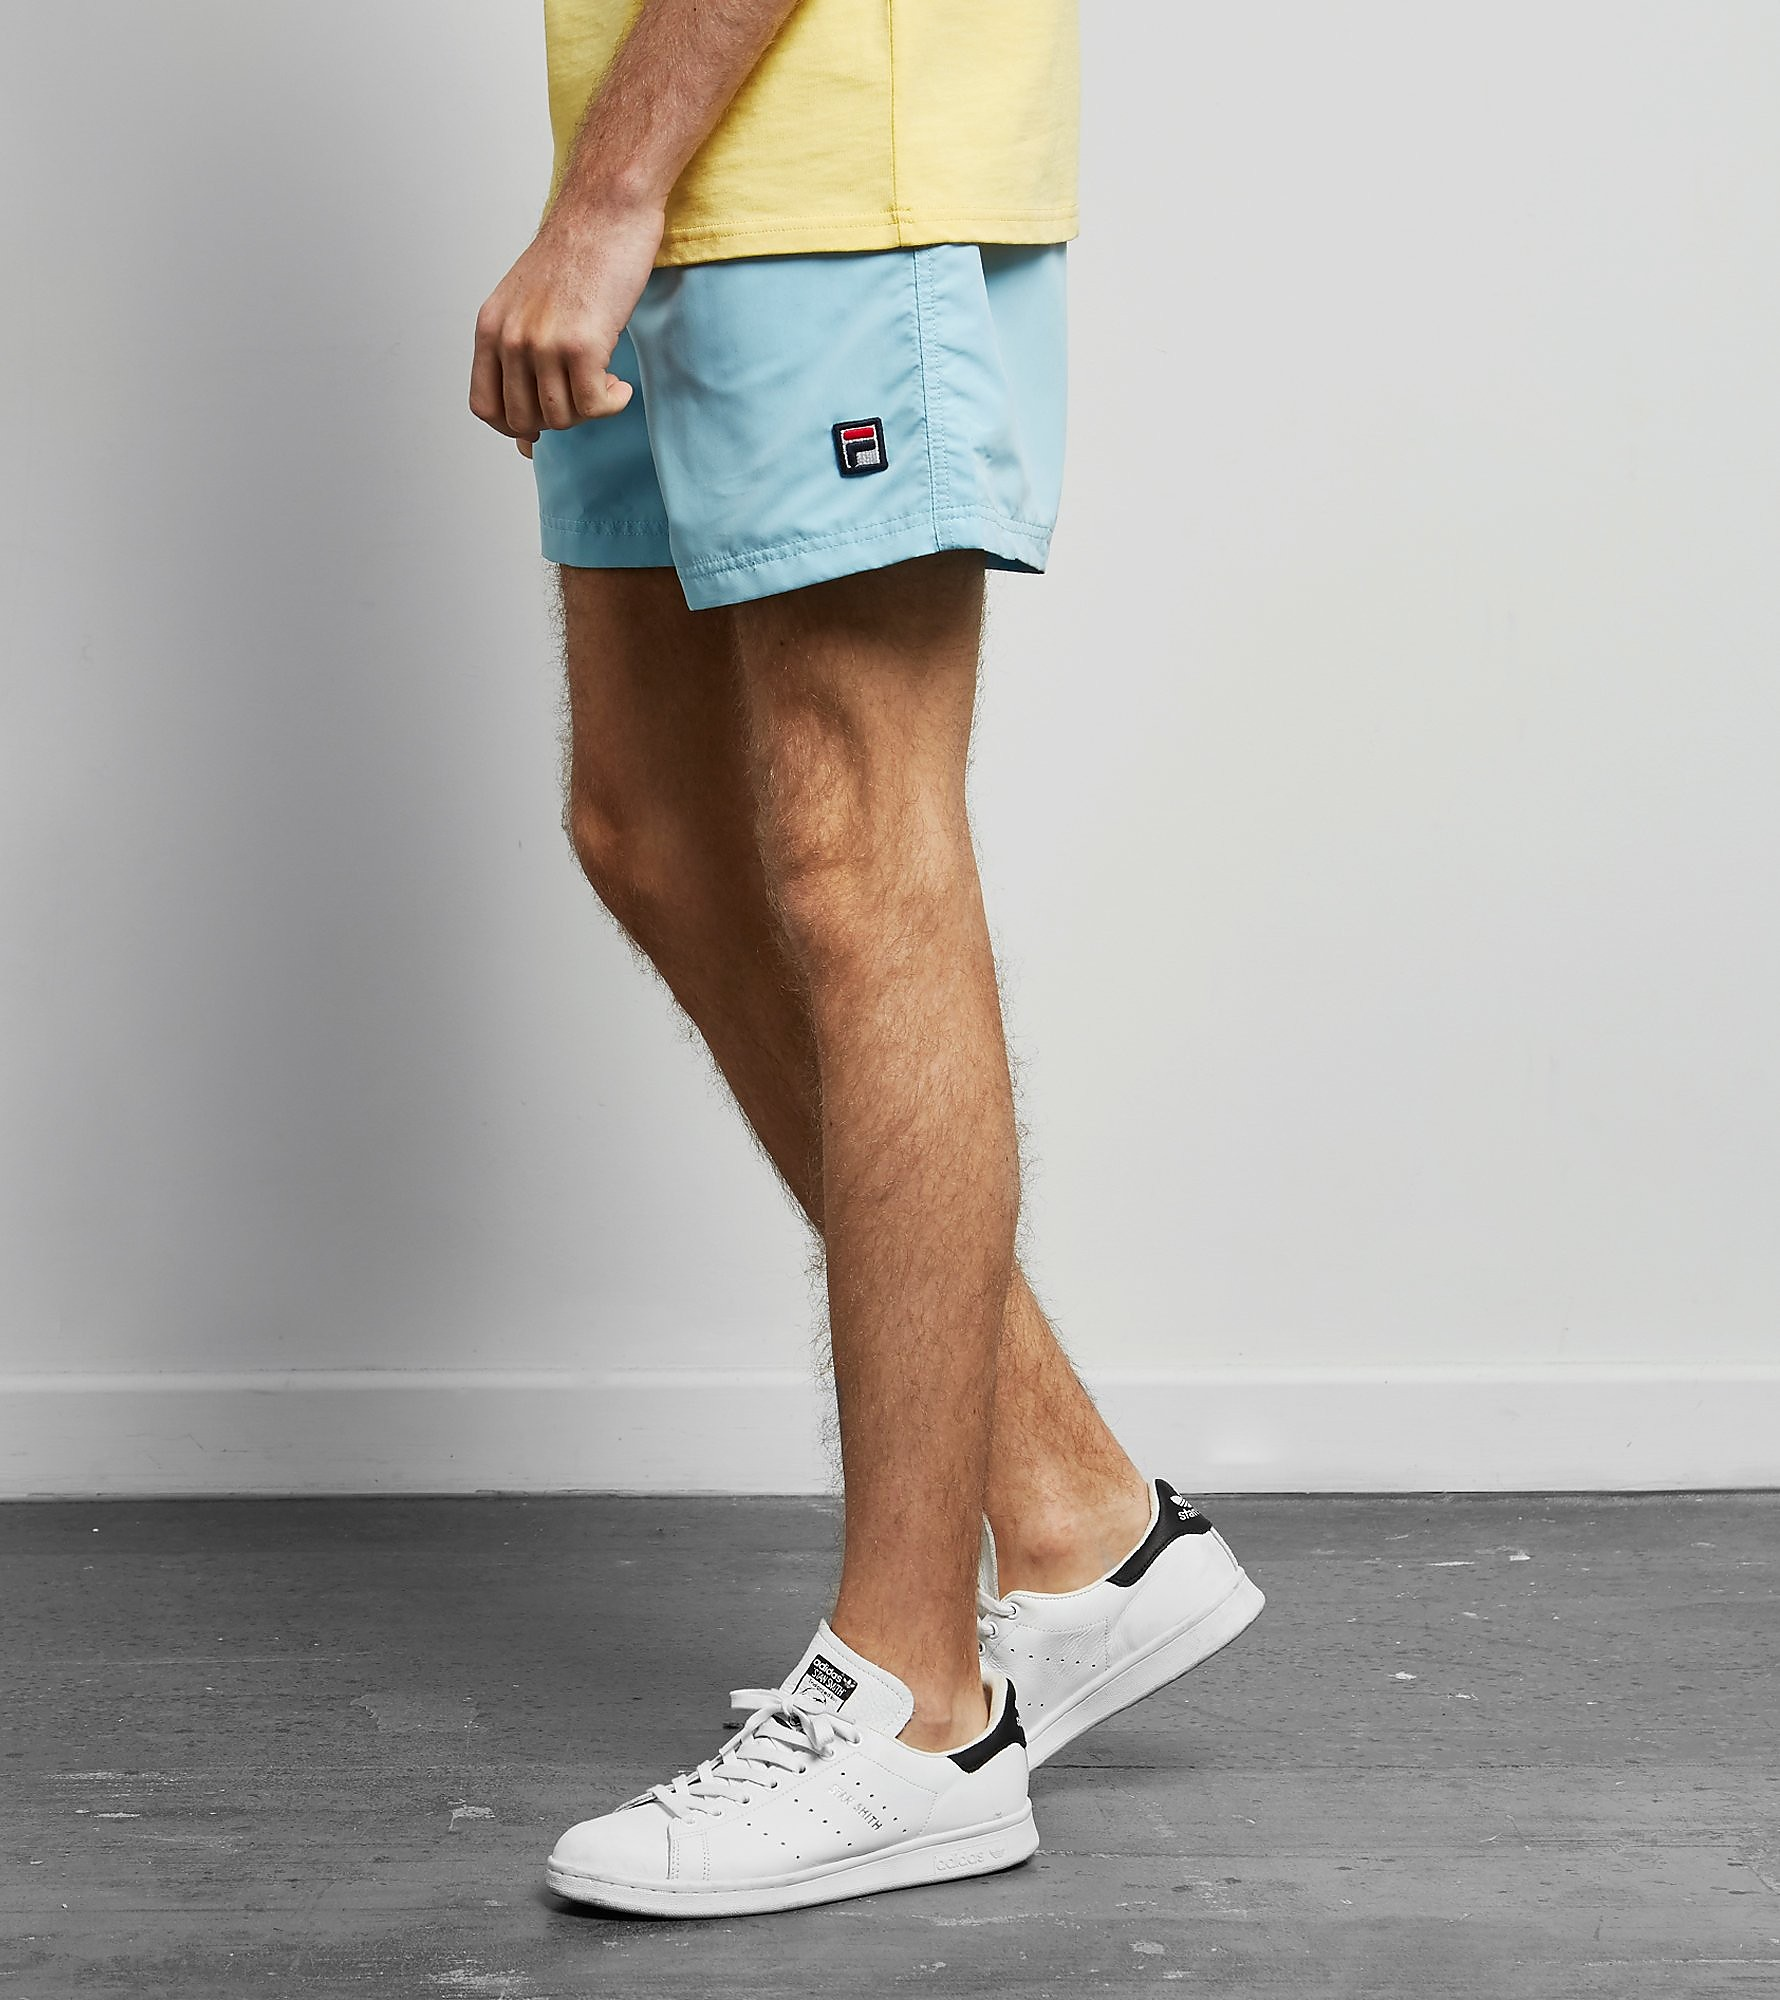 Fila Holiday Swim Shorts - size? Exclusive